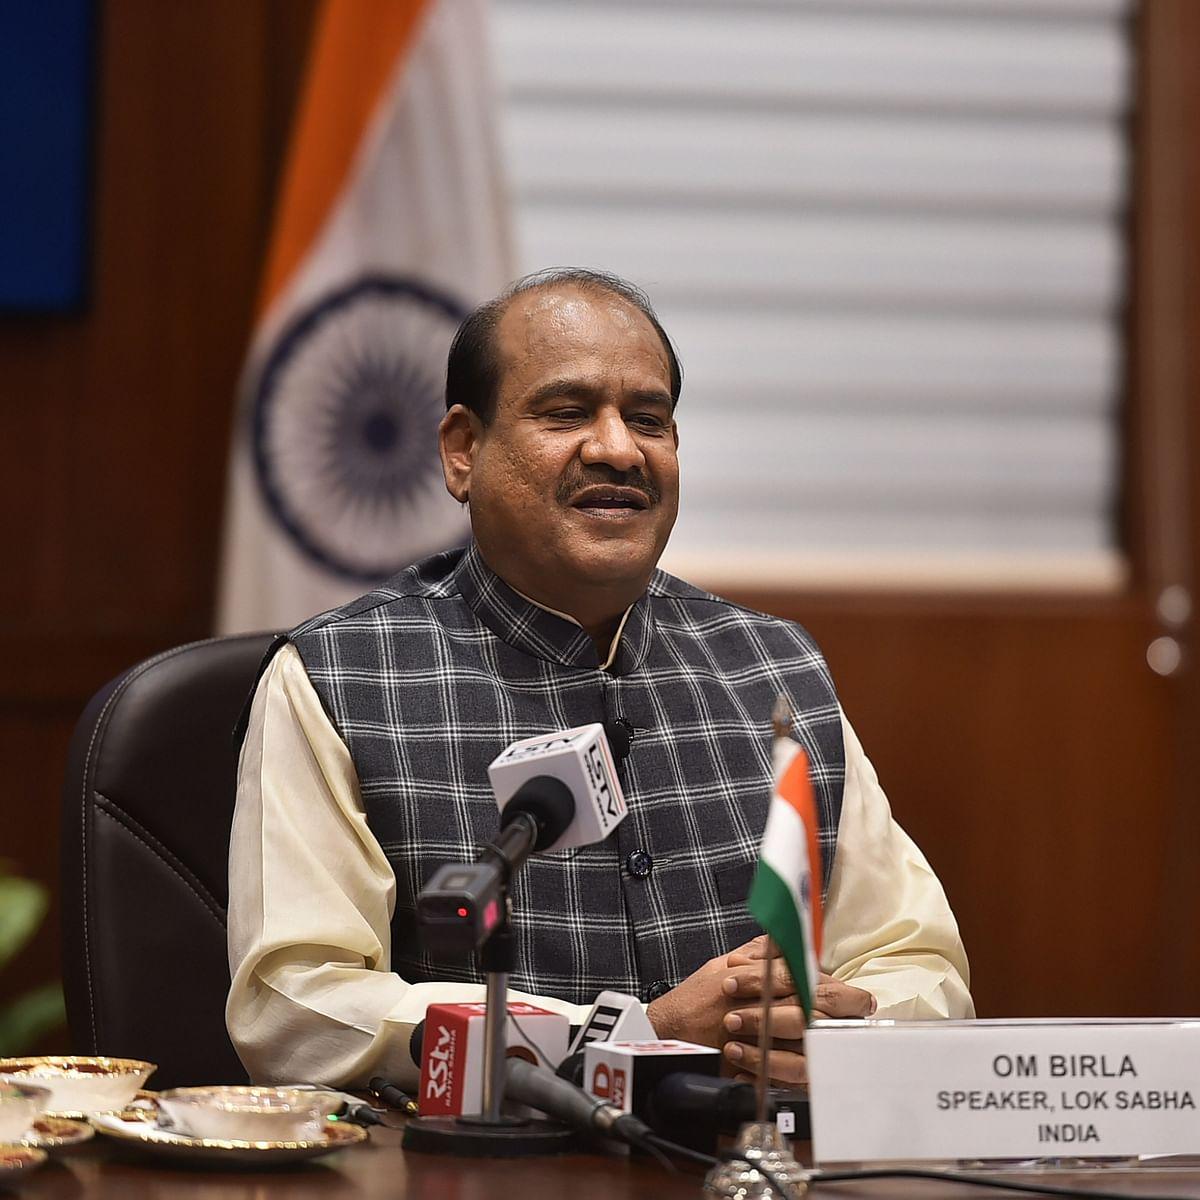 Lok Sabha Speaker Om Birla's father passes away at 92